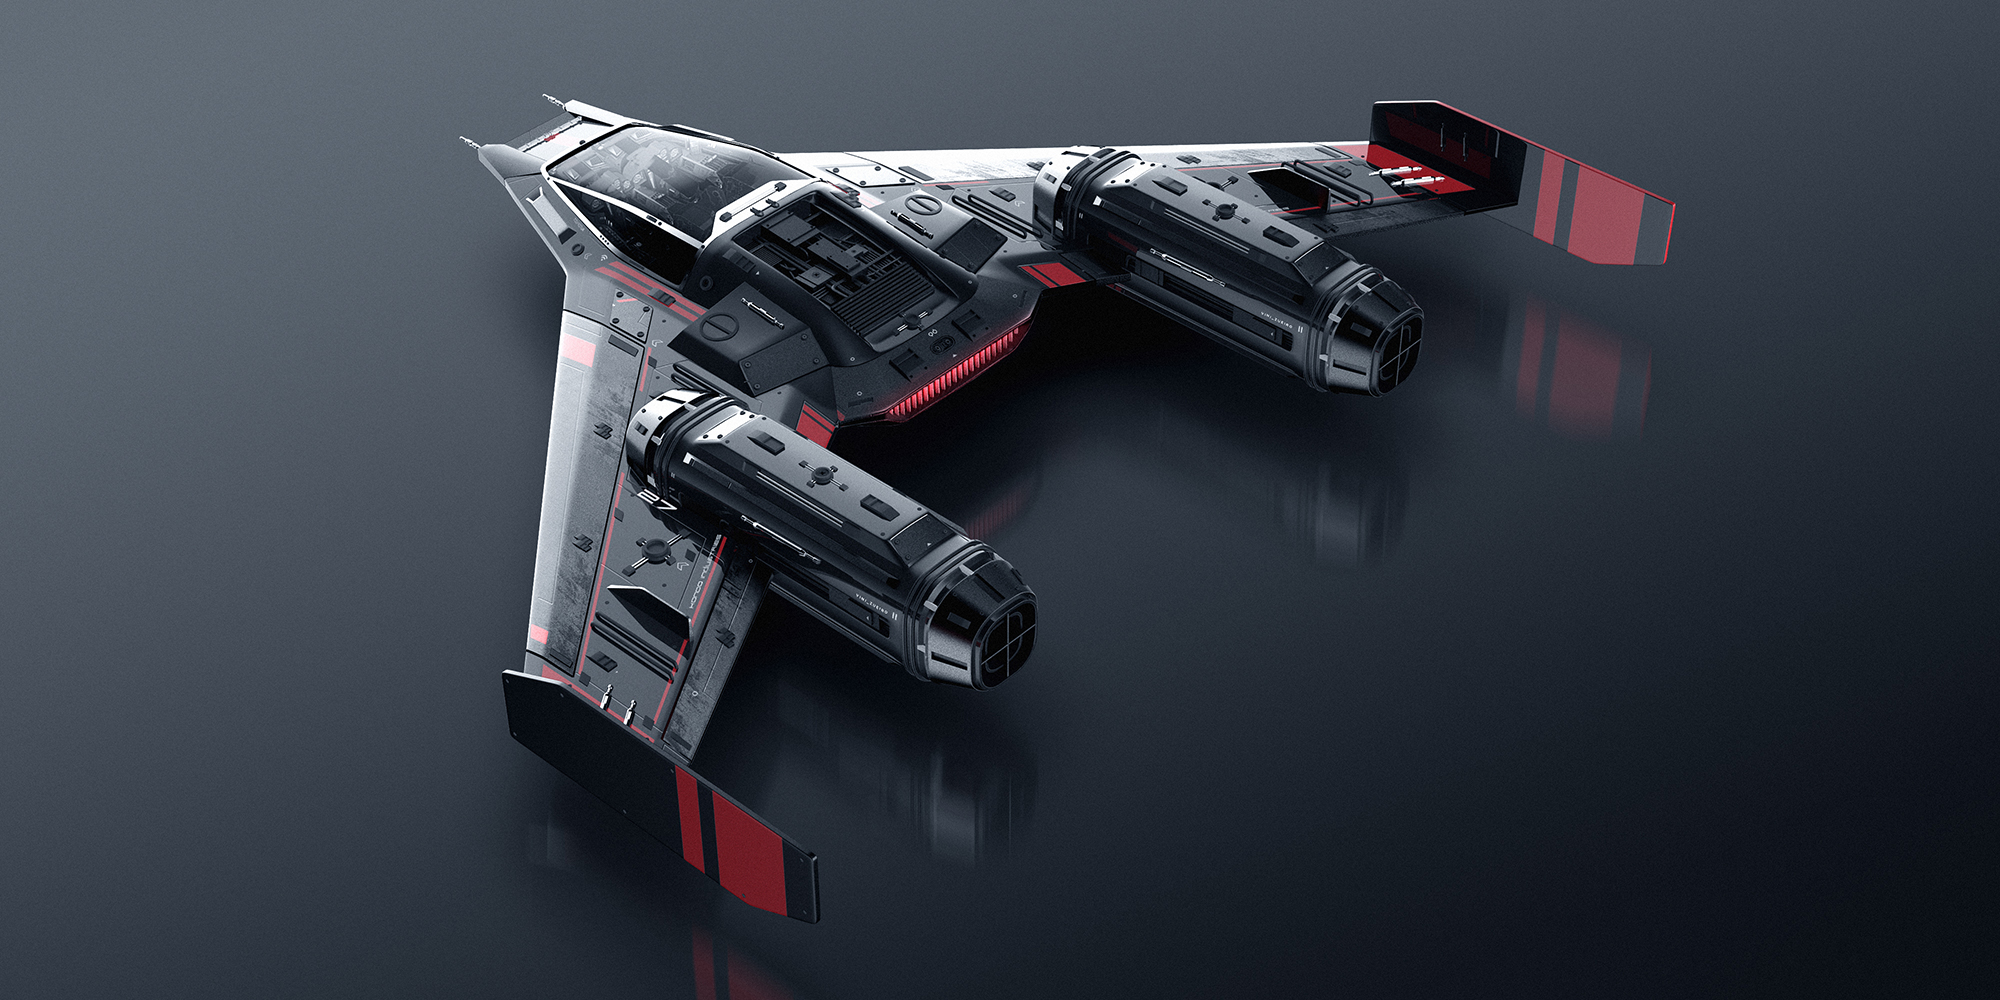 Spaceship_003_Back1_web